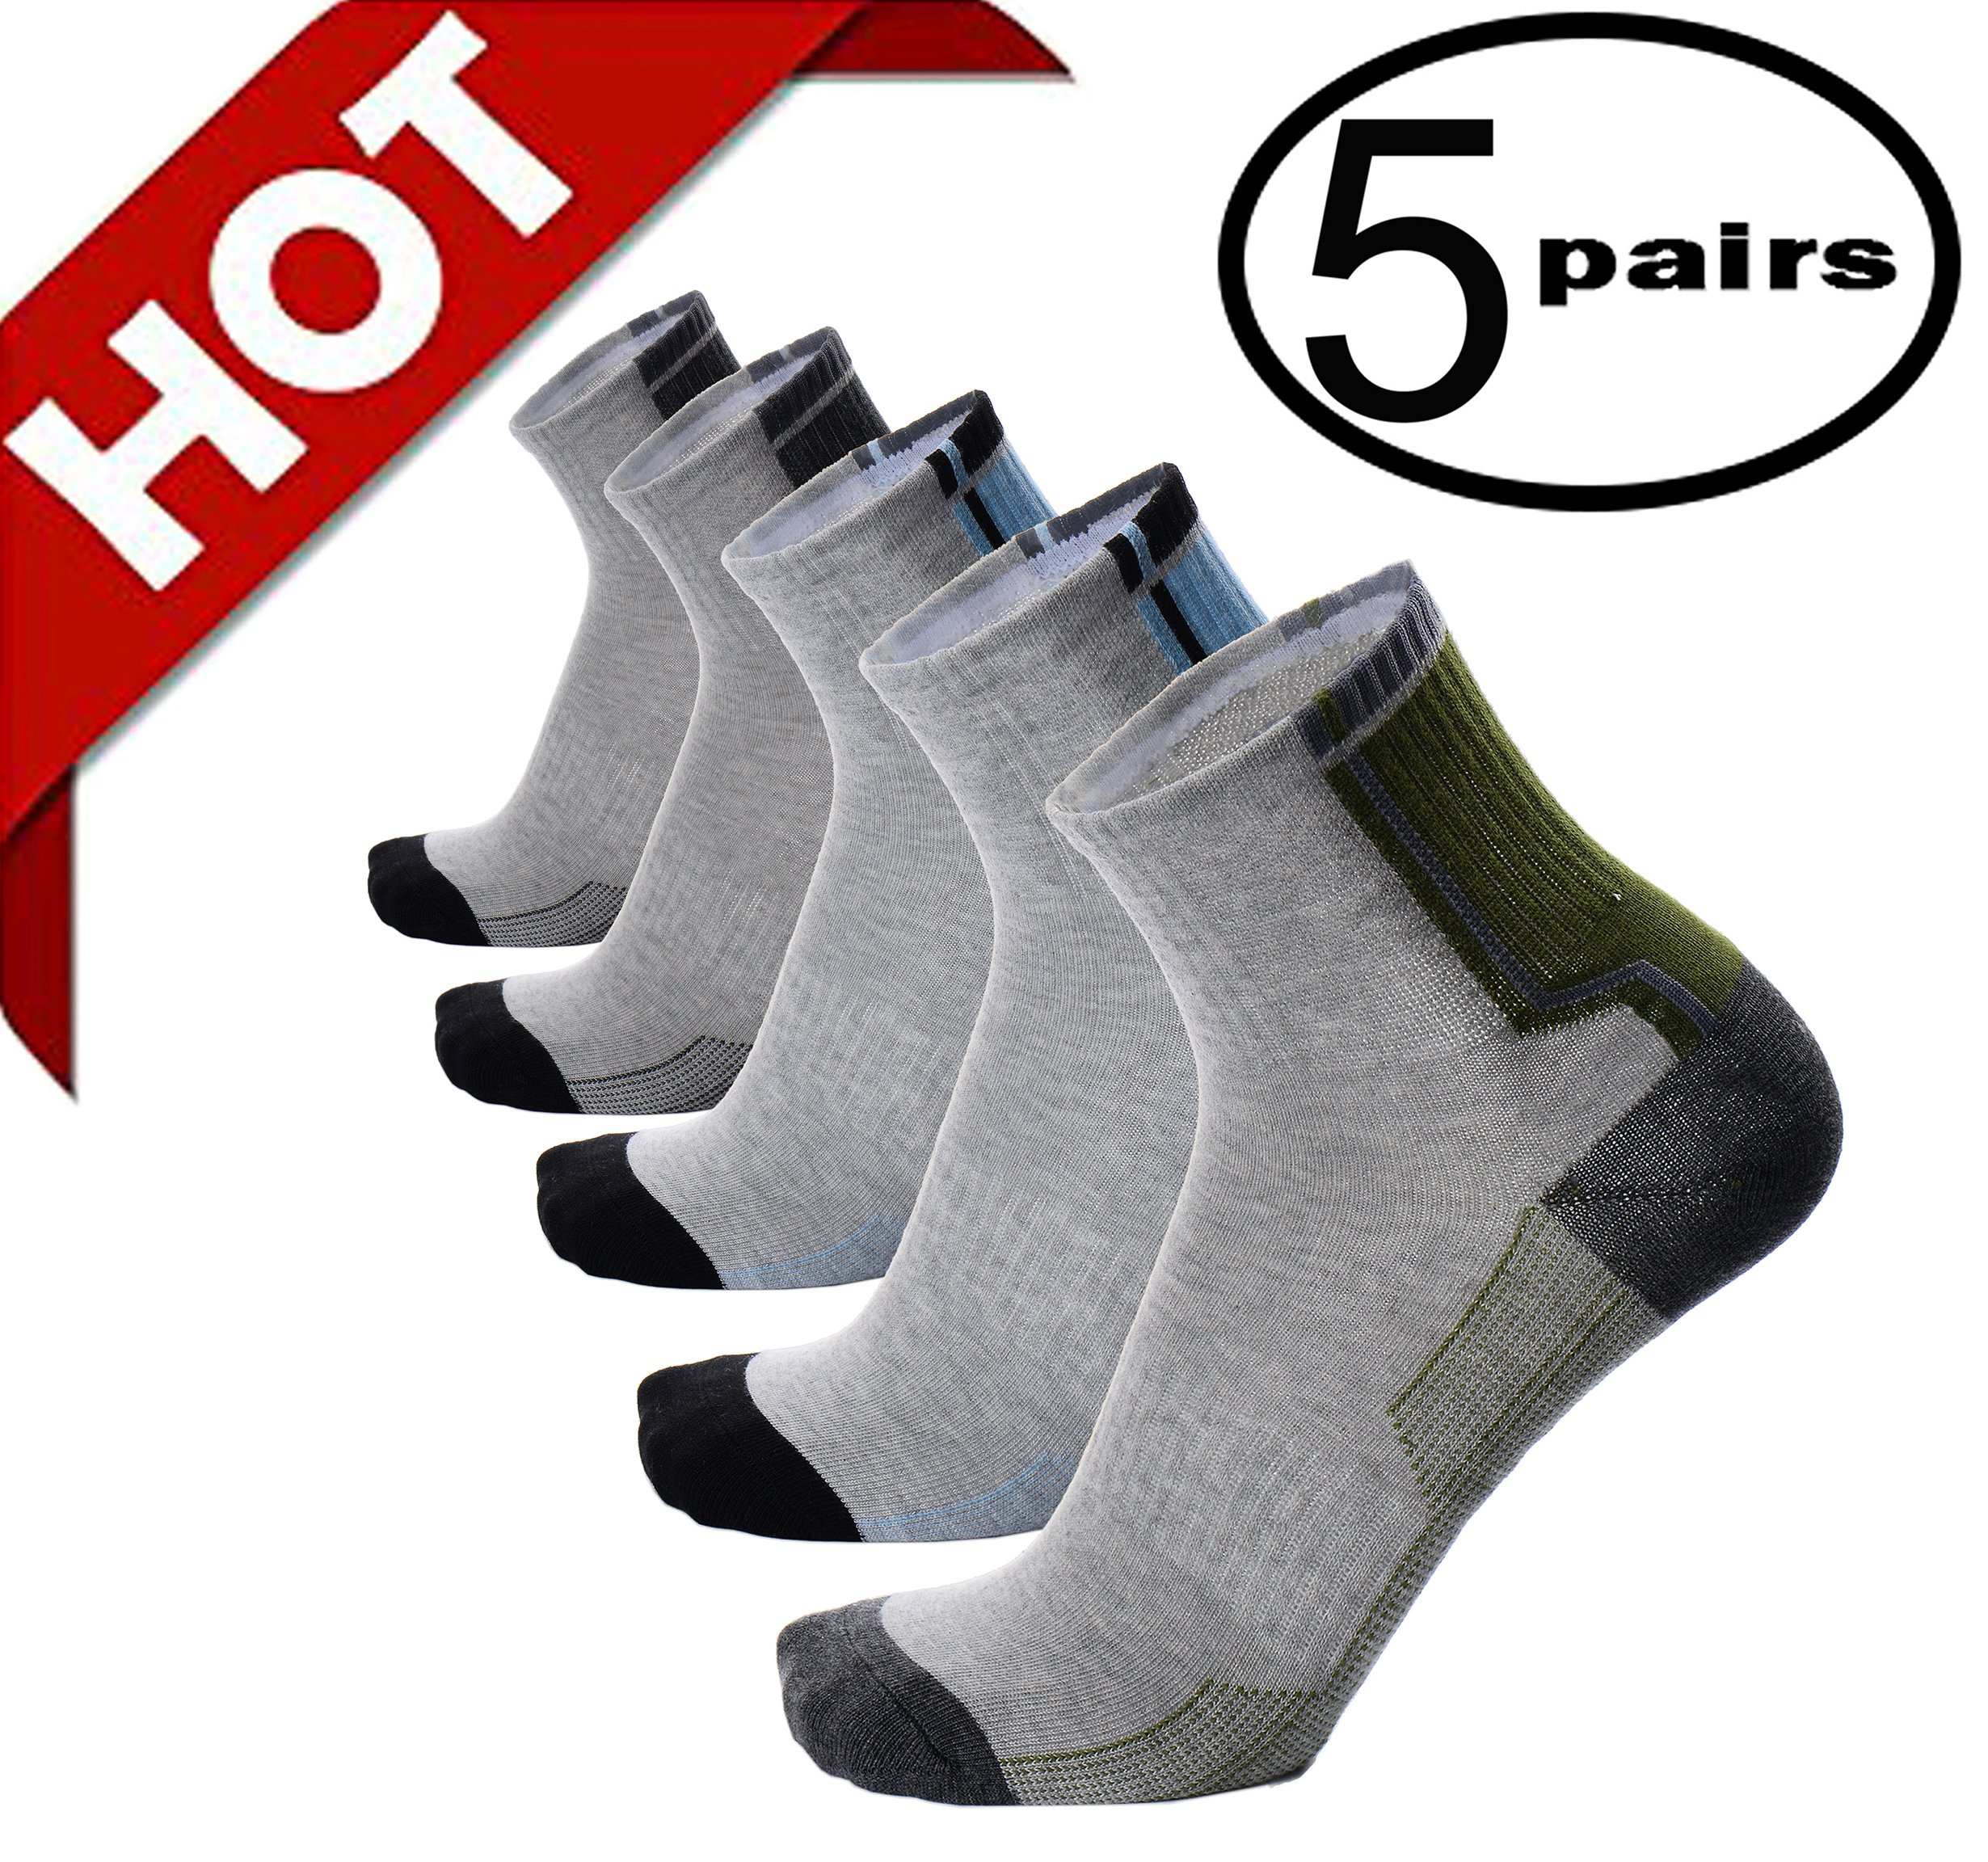 Mens Boys Athletic Sports Compression Cotton Low Cut Quarter Summer Ankle Grey Socks